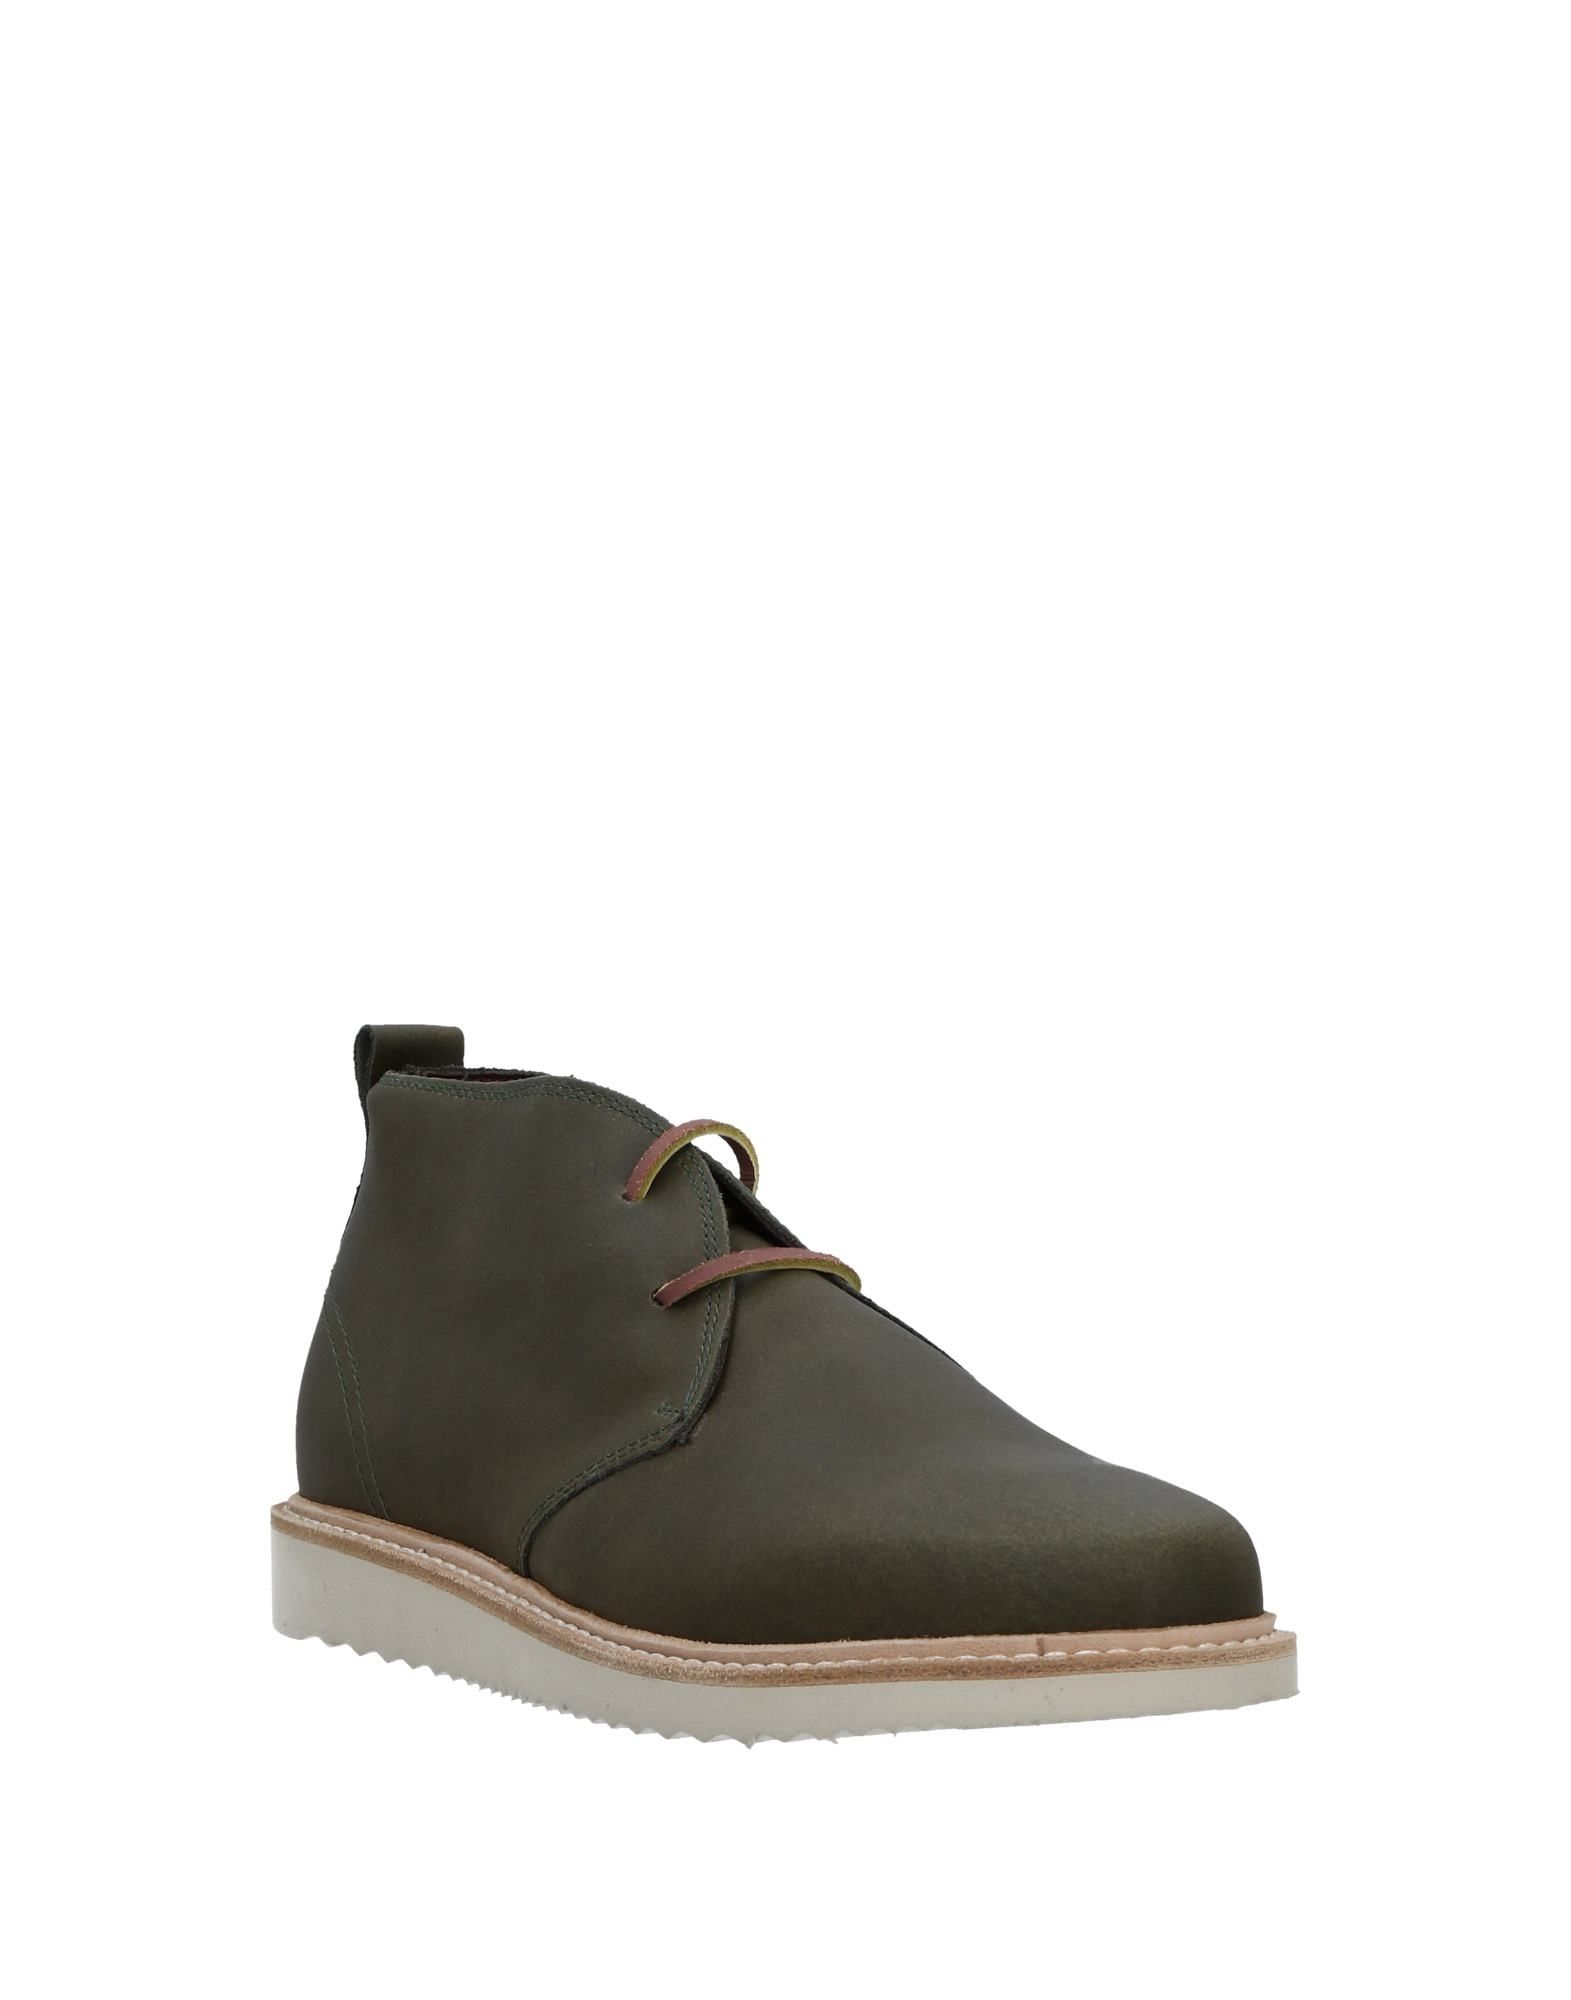 Rabatt echte Stiefelette Schuhe Laboratorio Base Stiefelette echte Herren  11532974EE 3e2aa6